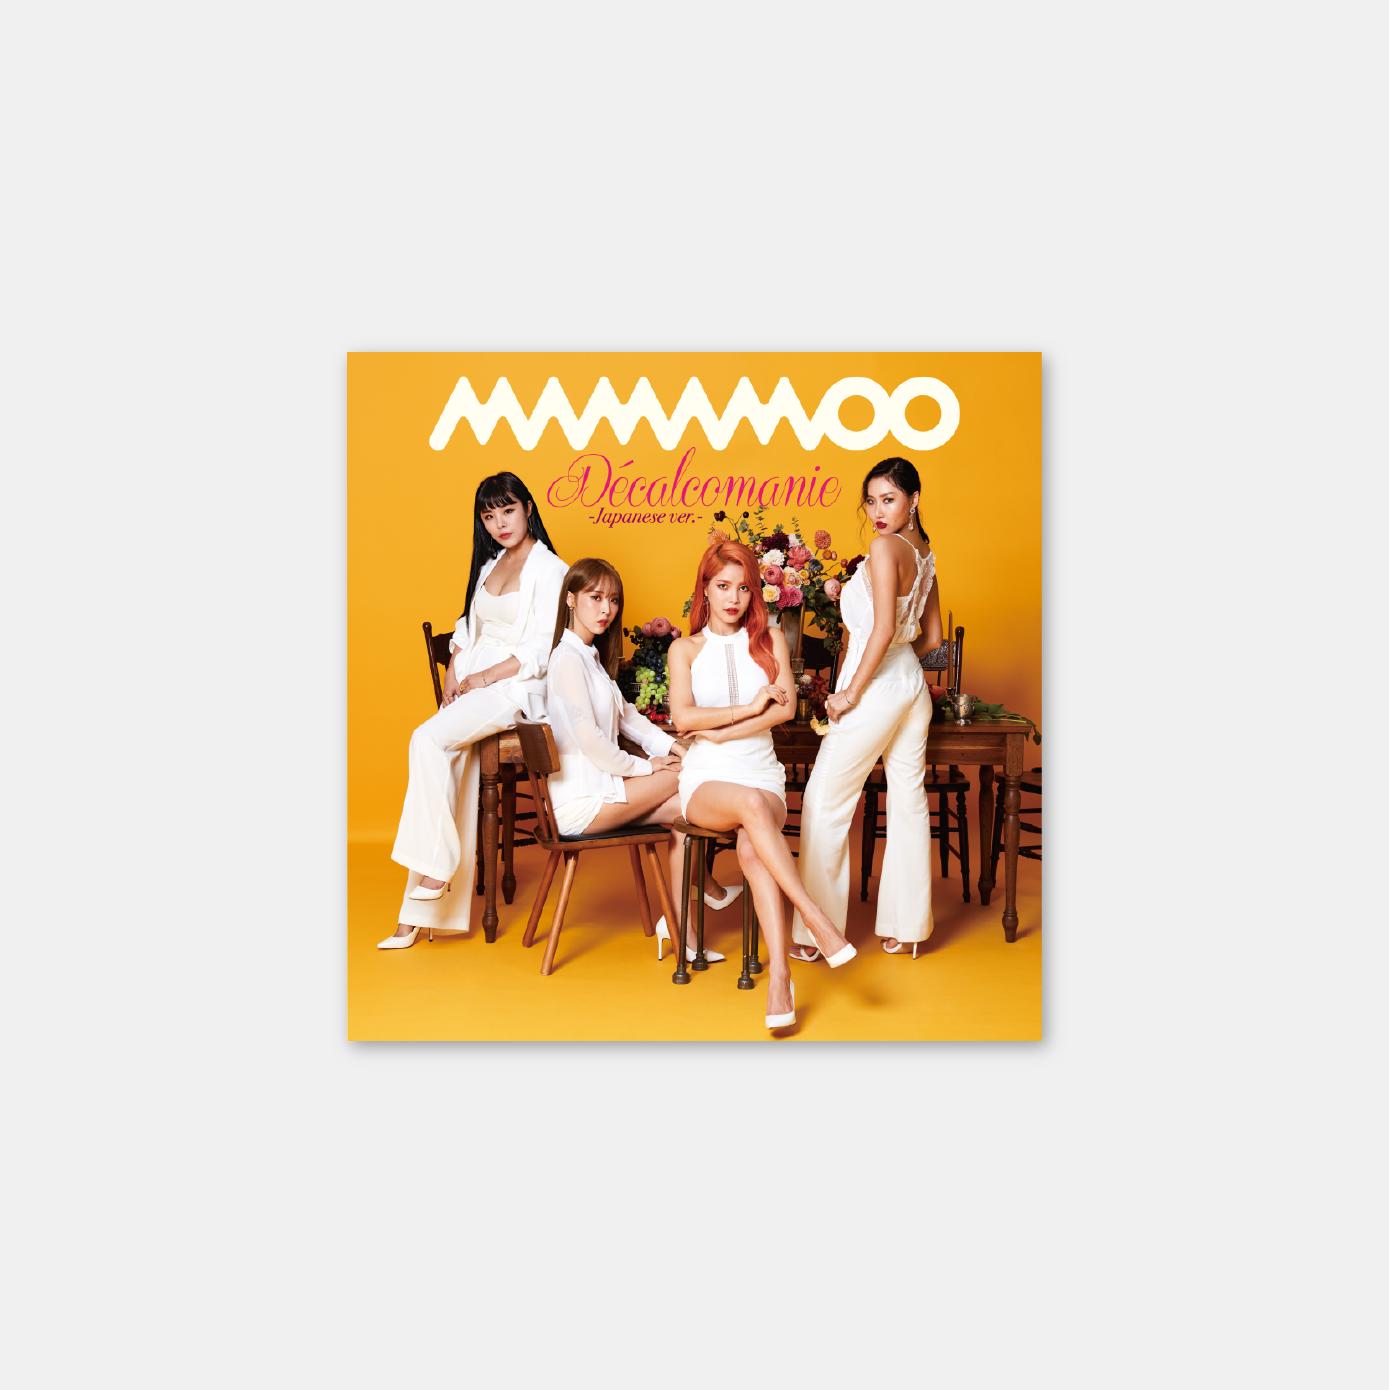 [MAMAMOO] Decalcomanie -Japanese